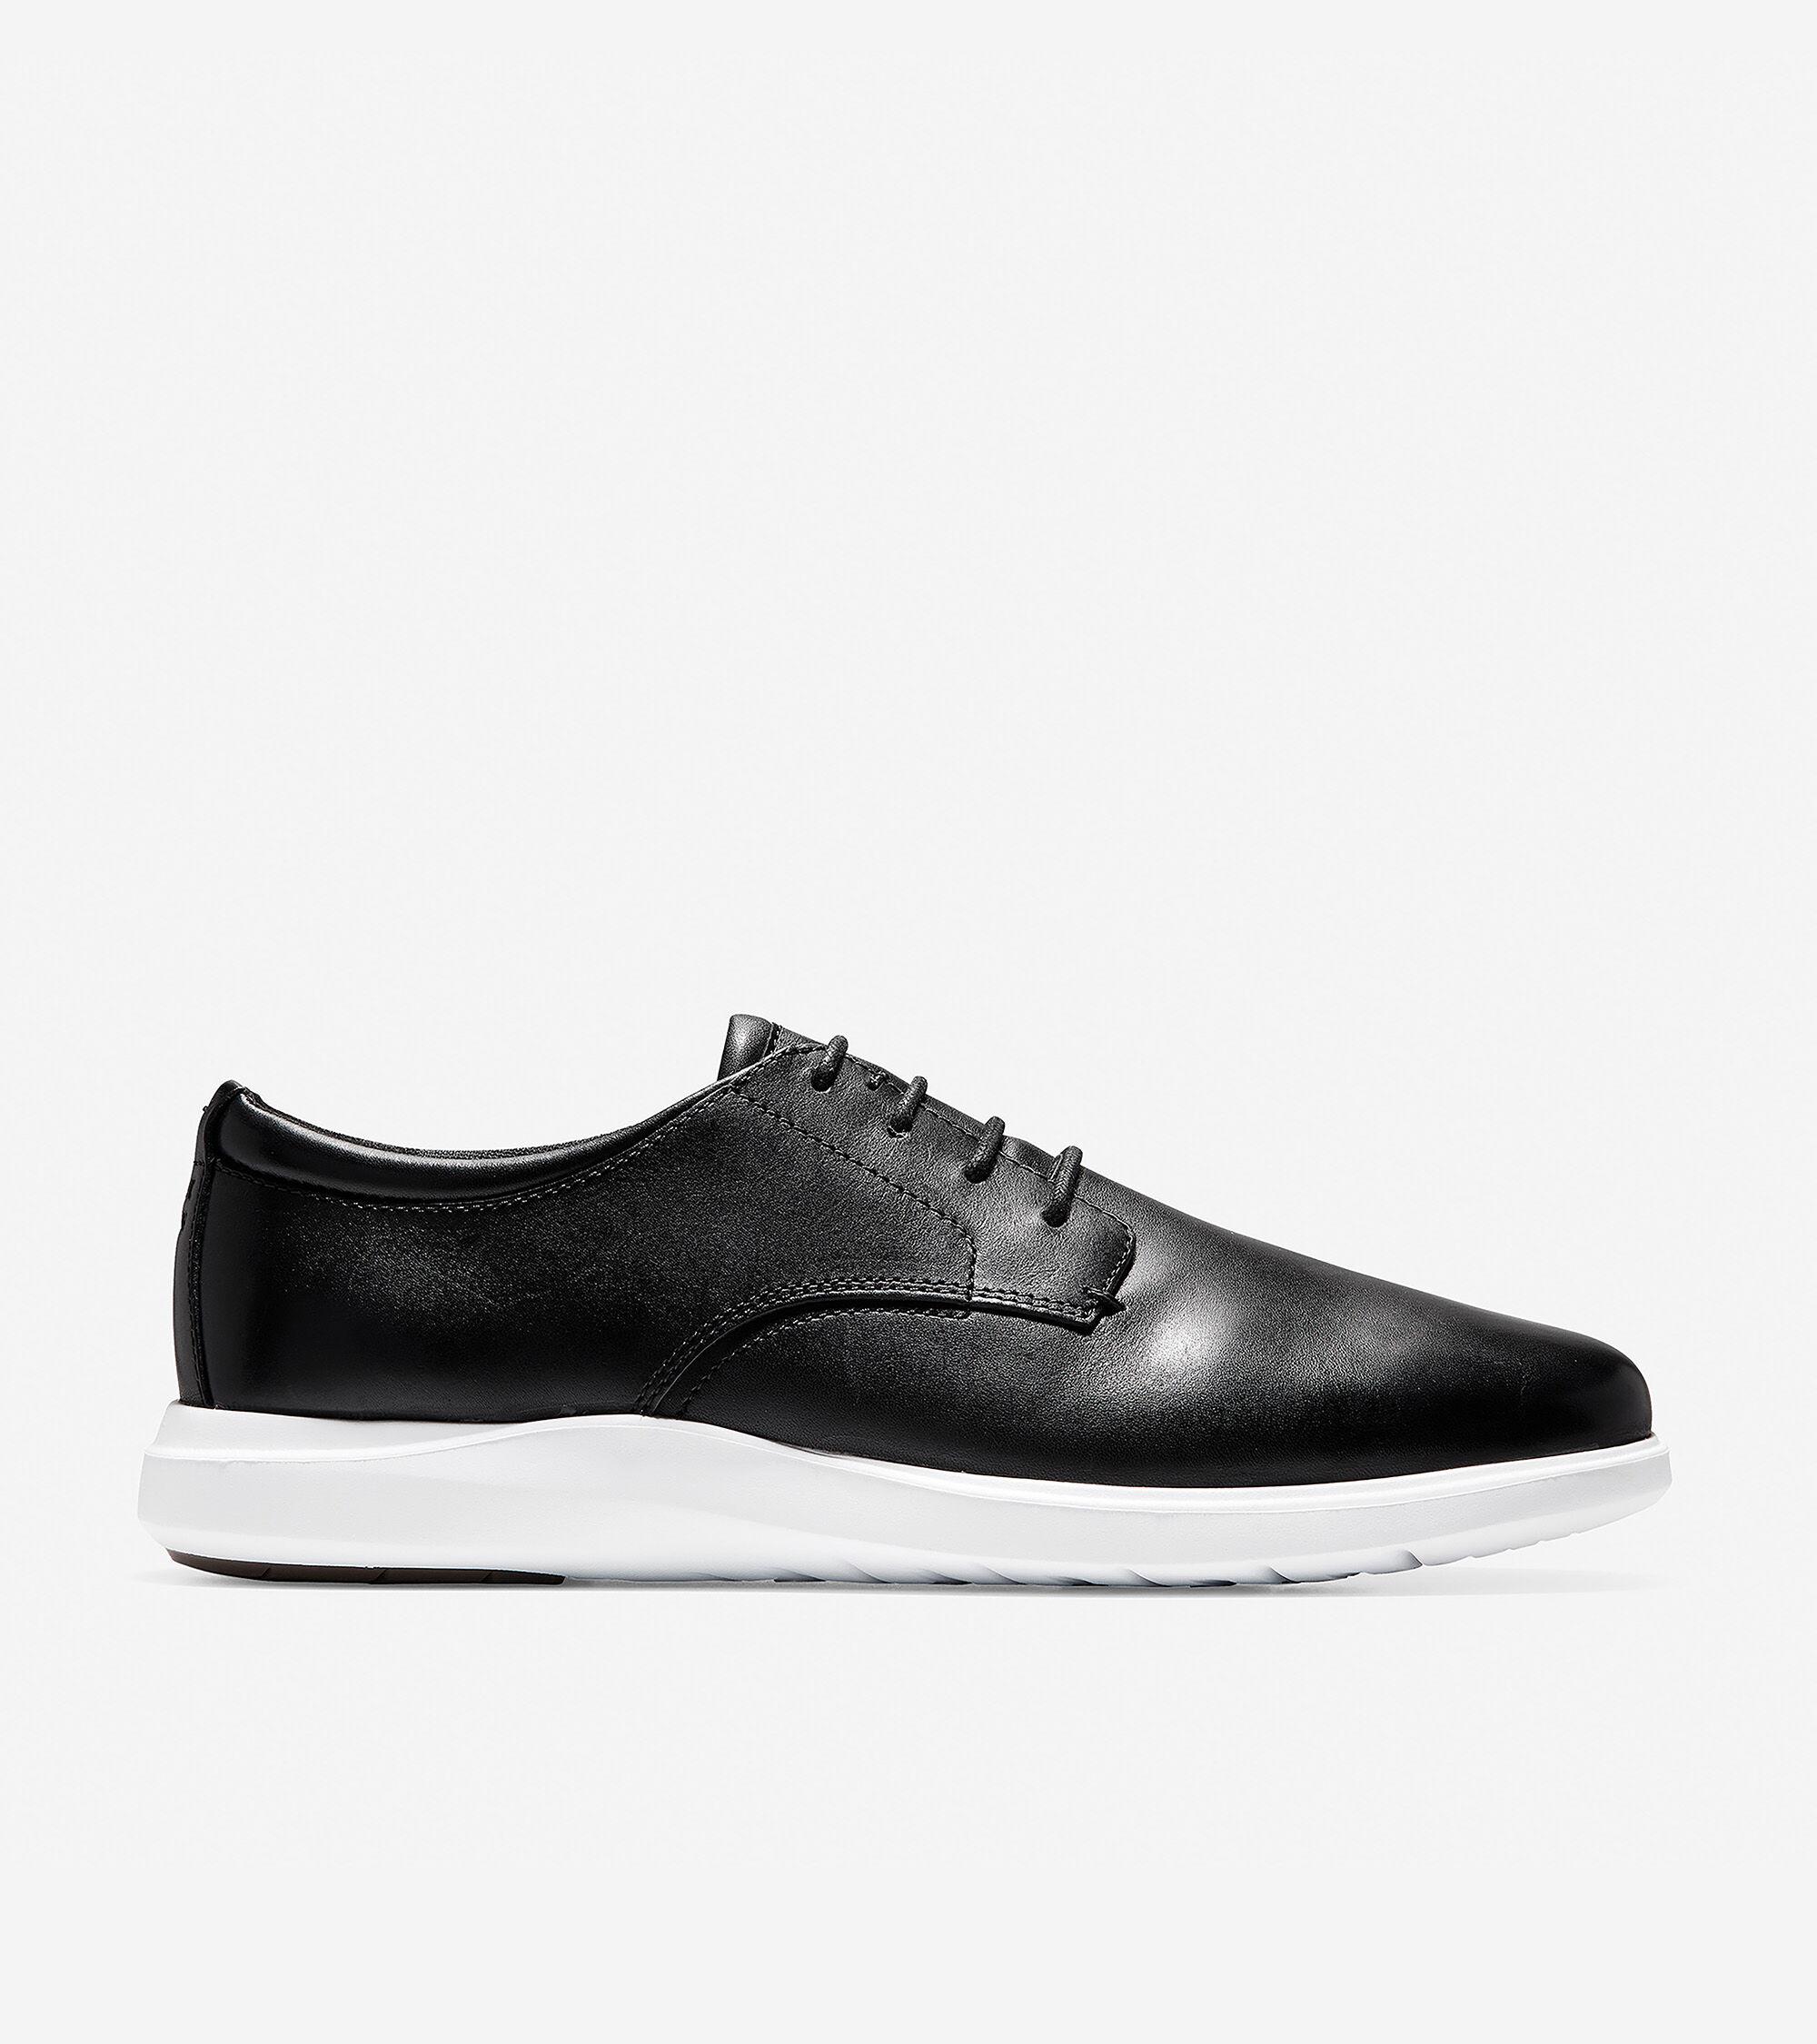 Men's Shoes  Oxfords, Boots, Sneakers